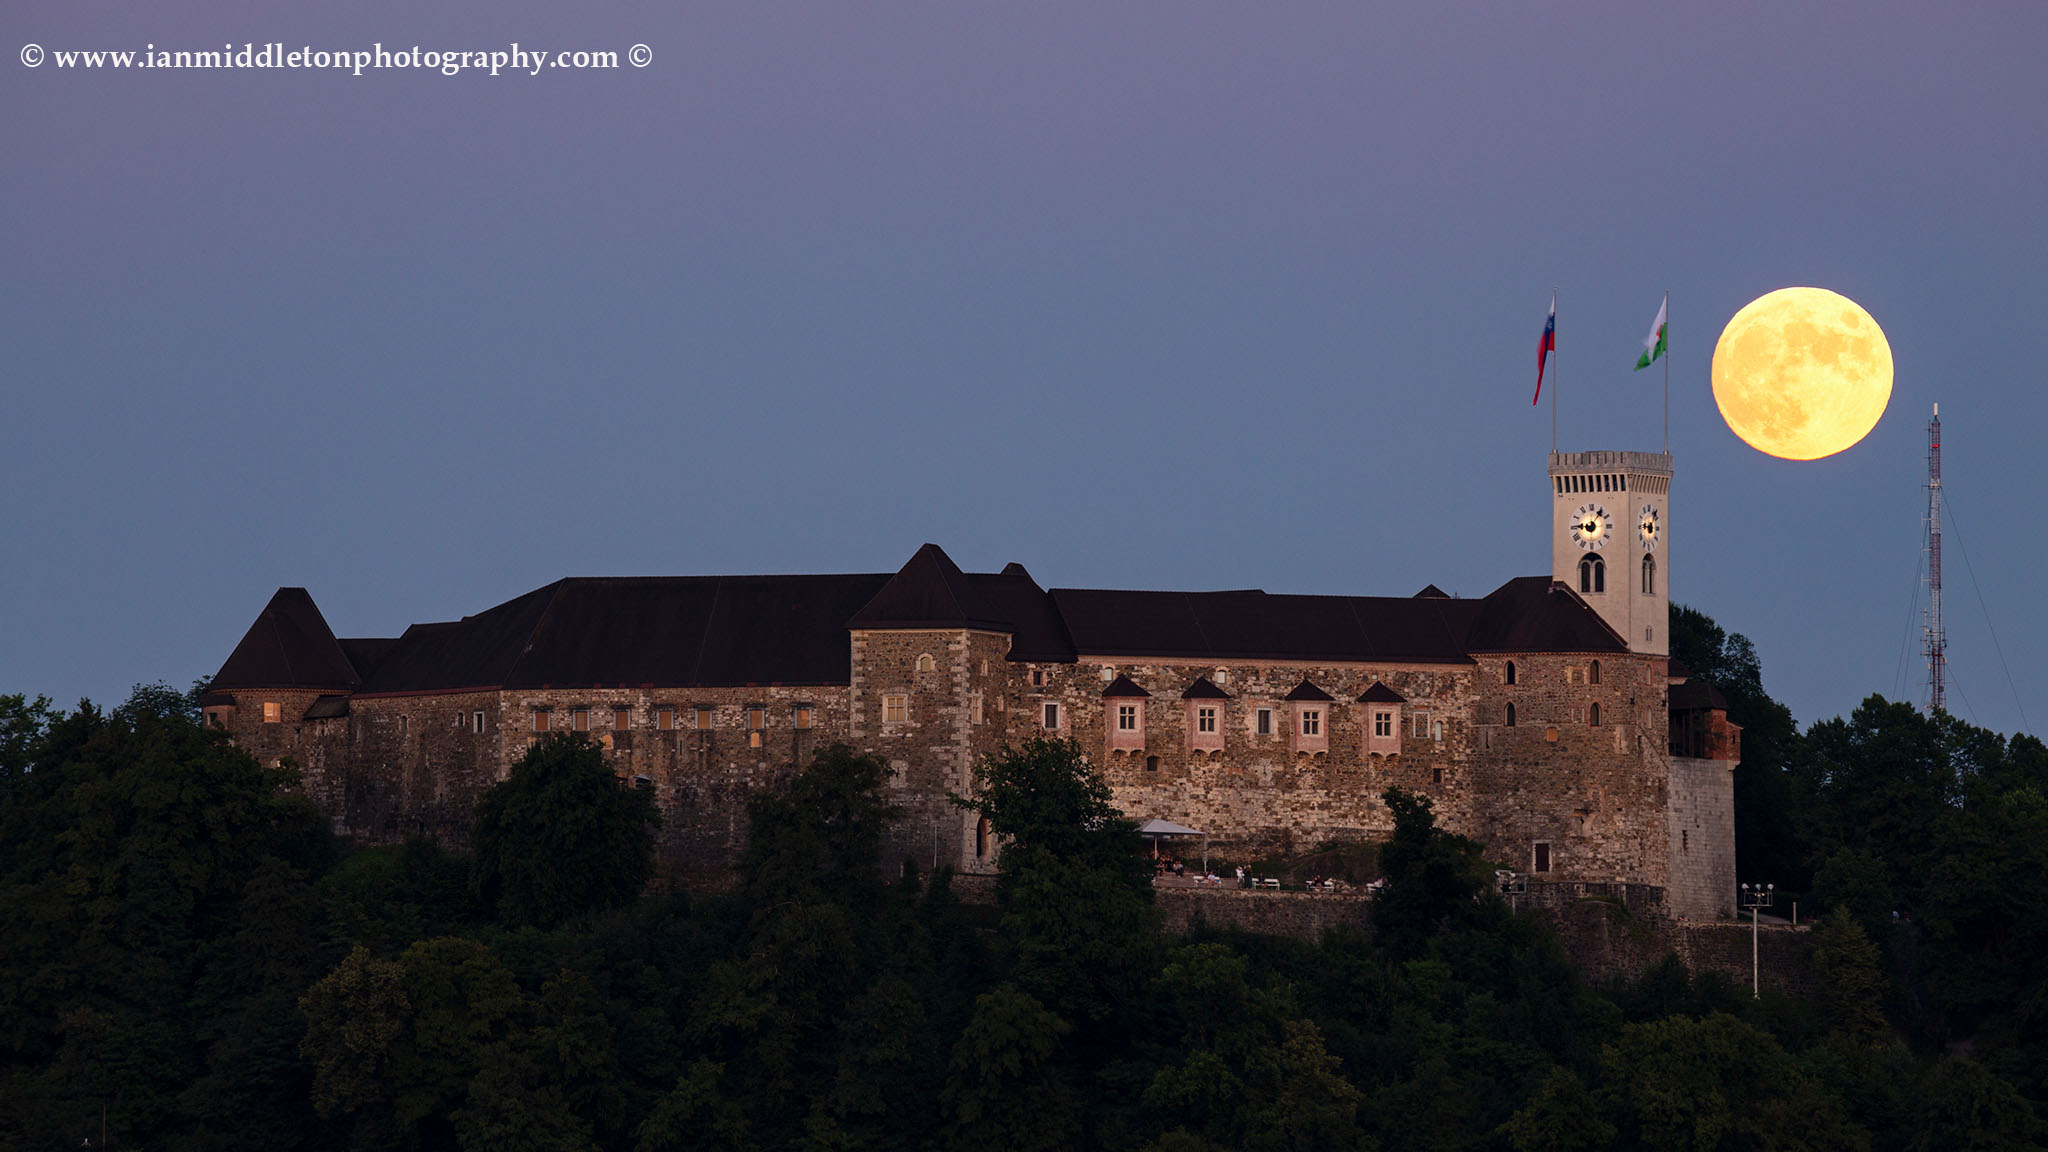 View across the to Ljubljana Castle as the full moon rises behind the tower. Seen from Tivoli Park, Ljubljana, Slovenia.